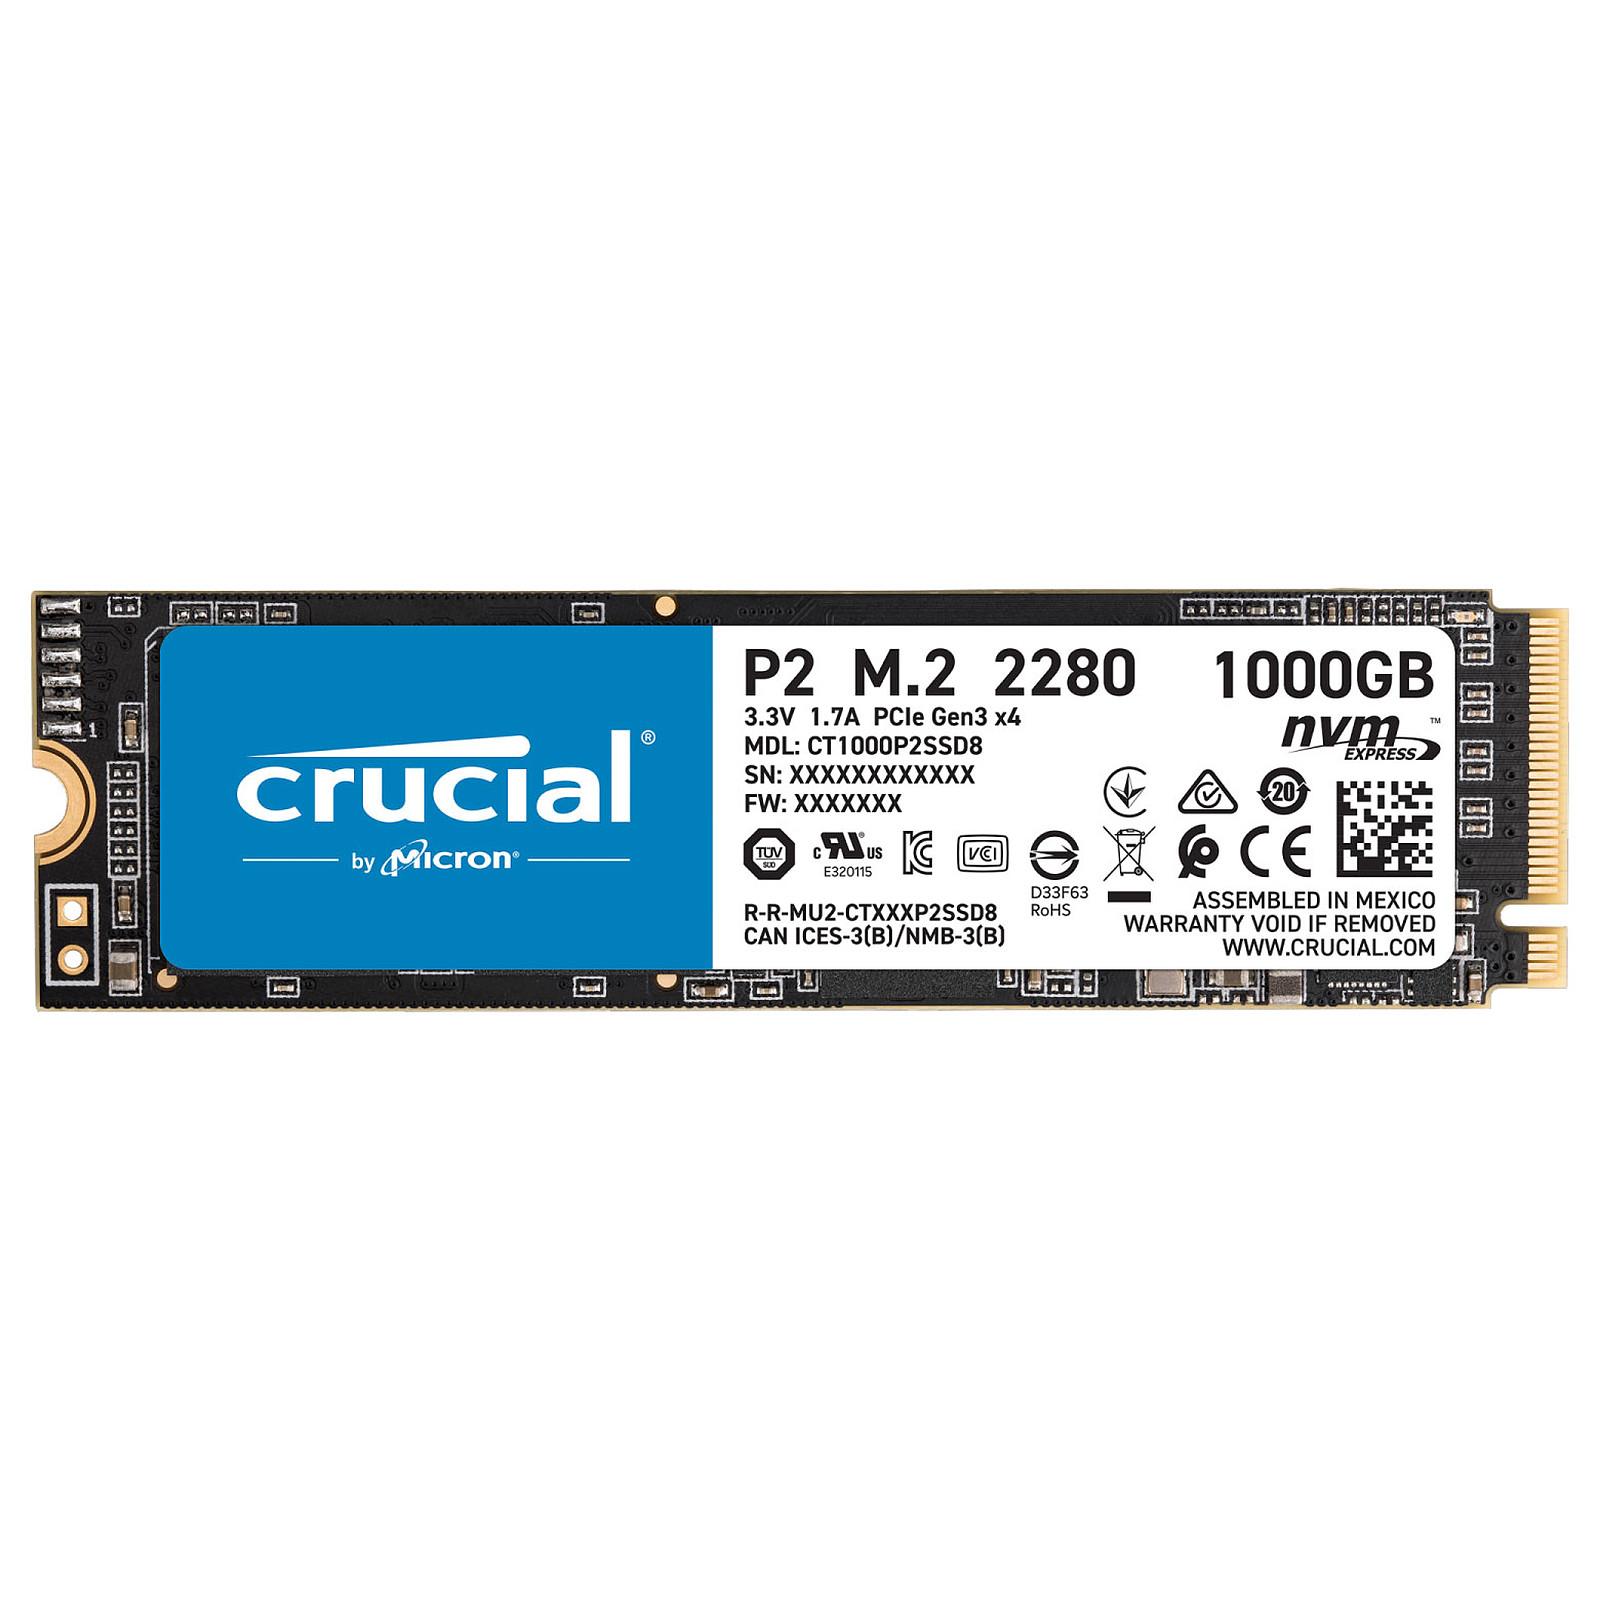 Crucial P2 960Go-1To M.2 - Disque SSD Crucial - Cybertek.fr - 0